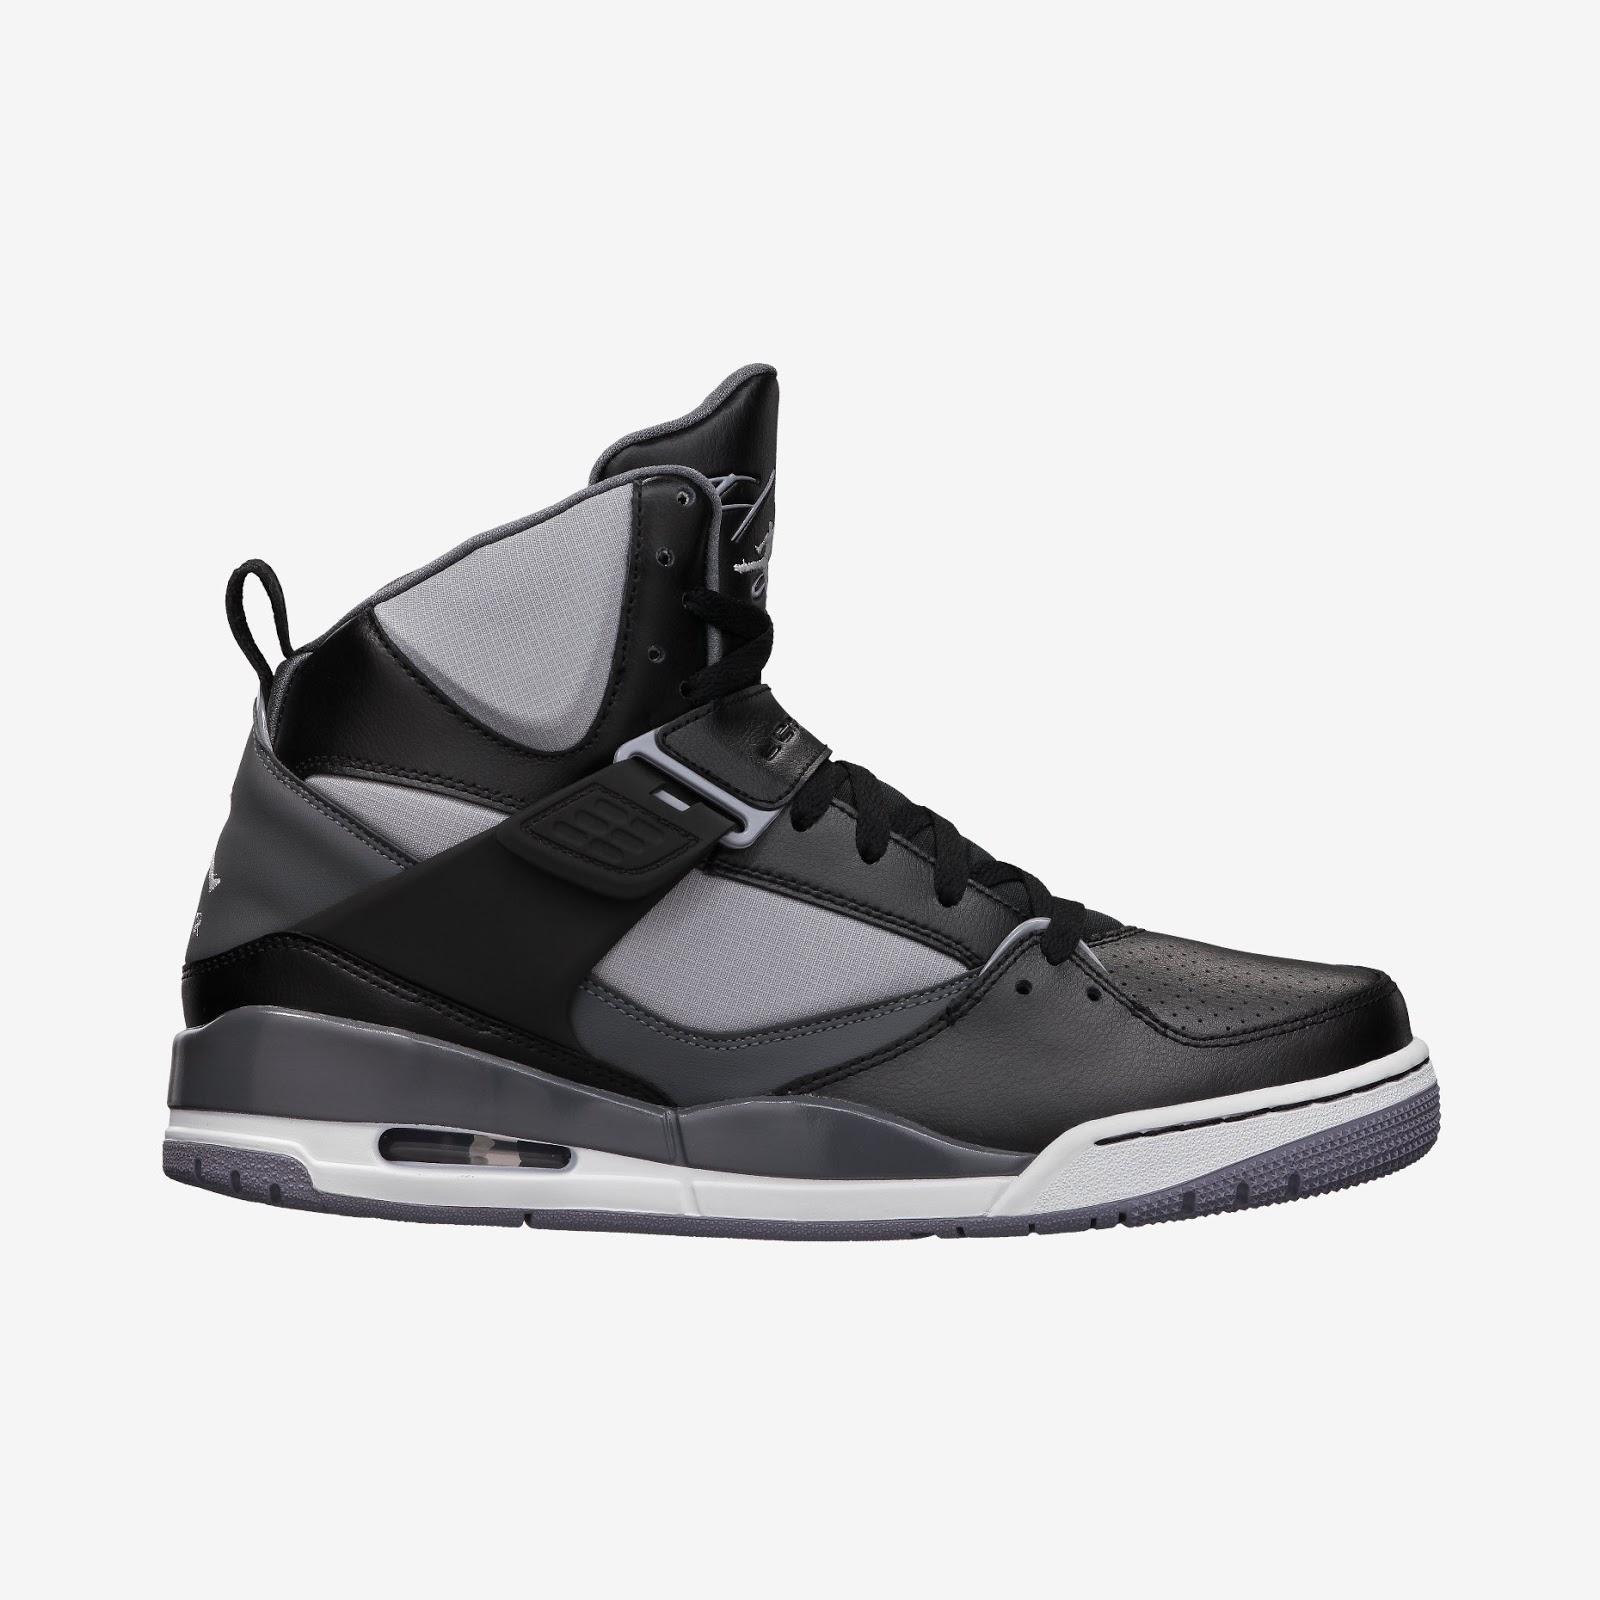 nike air jordan retro basketball shoes and sandals. Black Bedroom Furniture Sets. Home Design Ideas